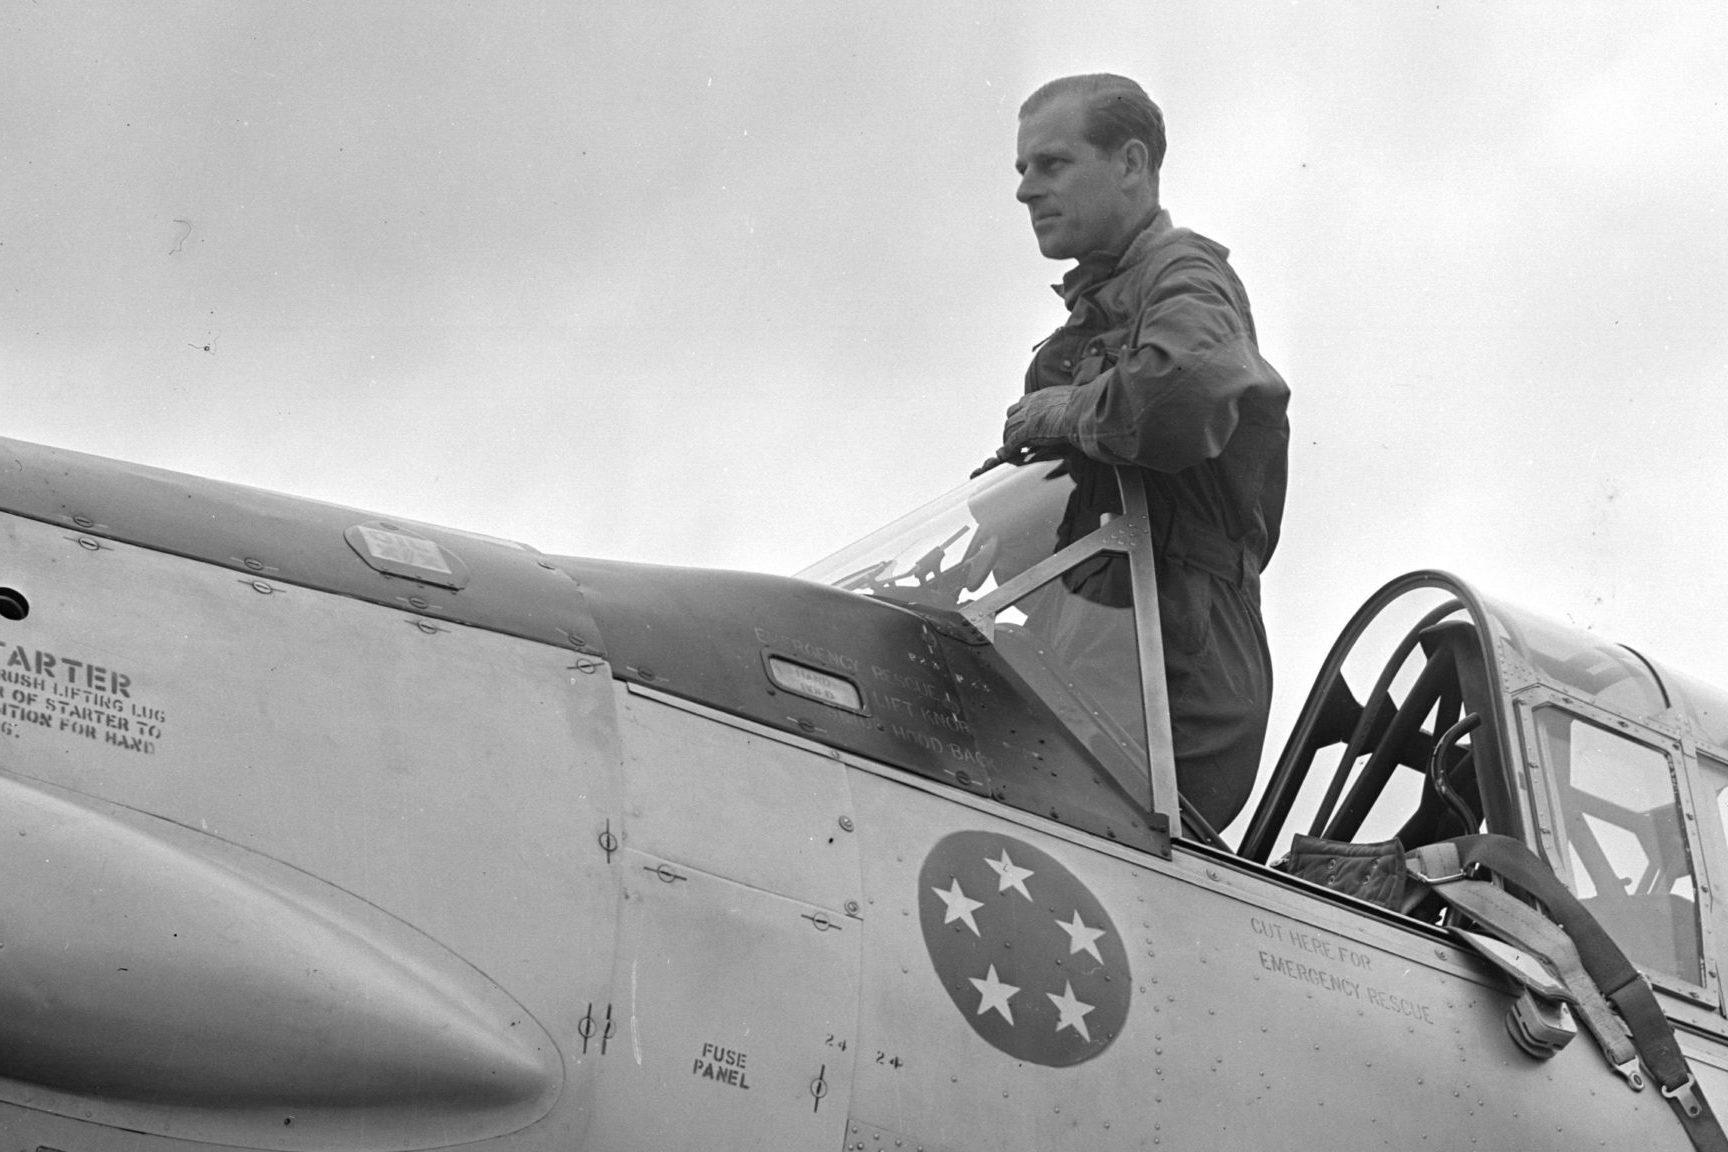 Prince Philip In Cockpit